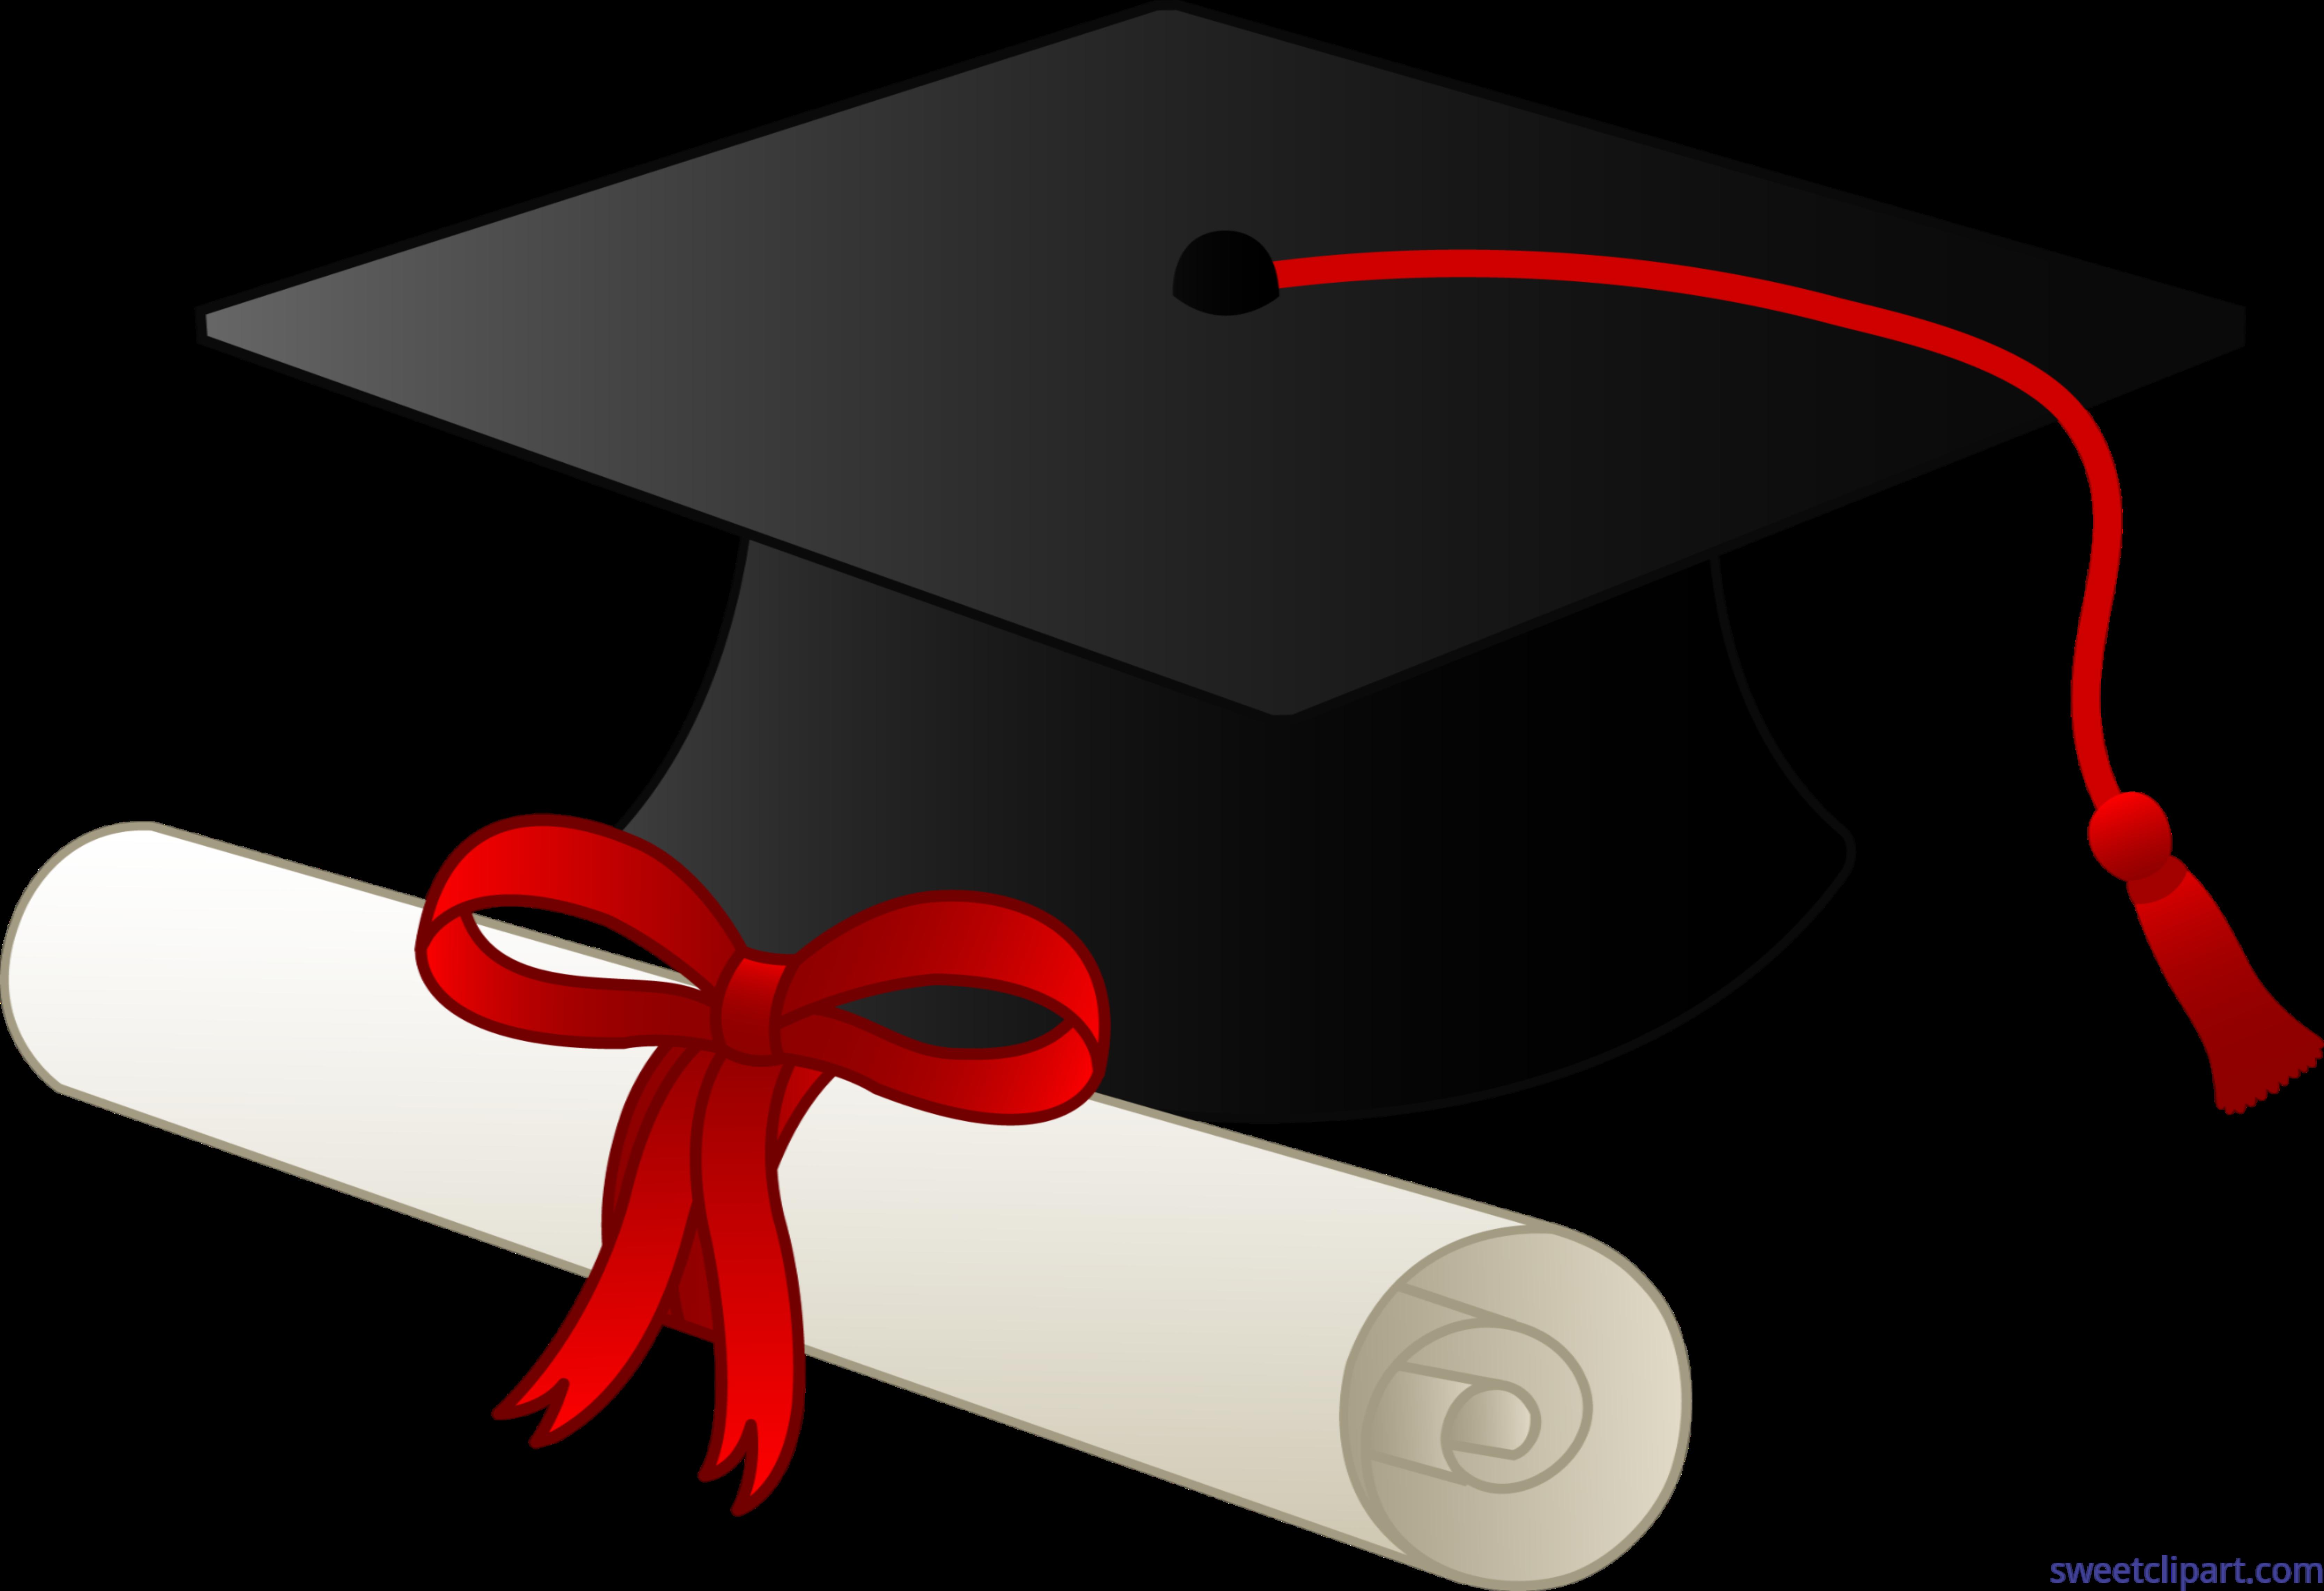 Graduation cap and diploma. Clipart hat education